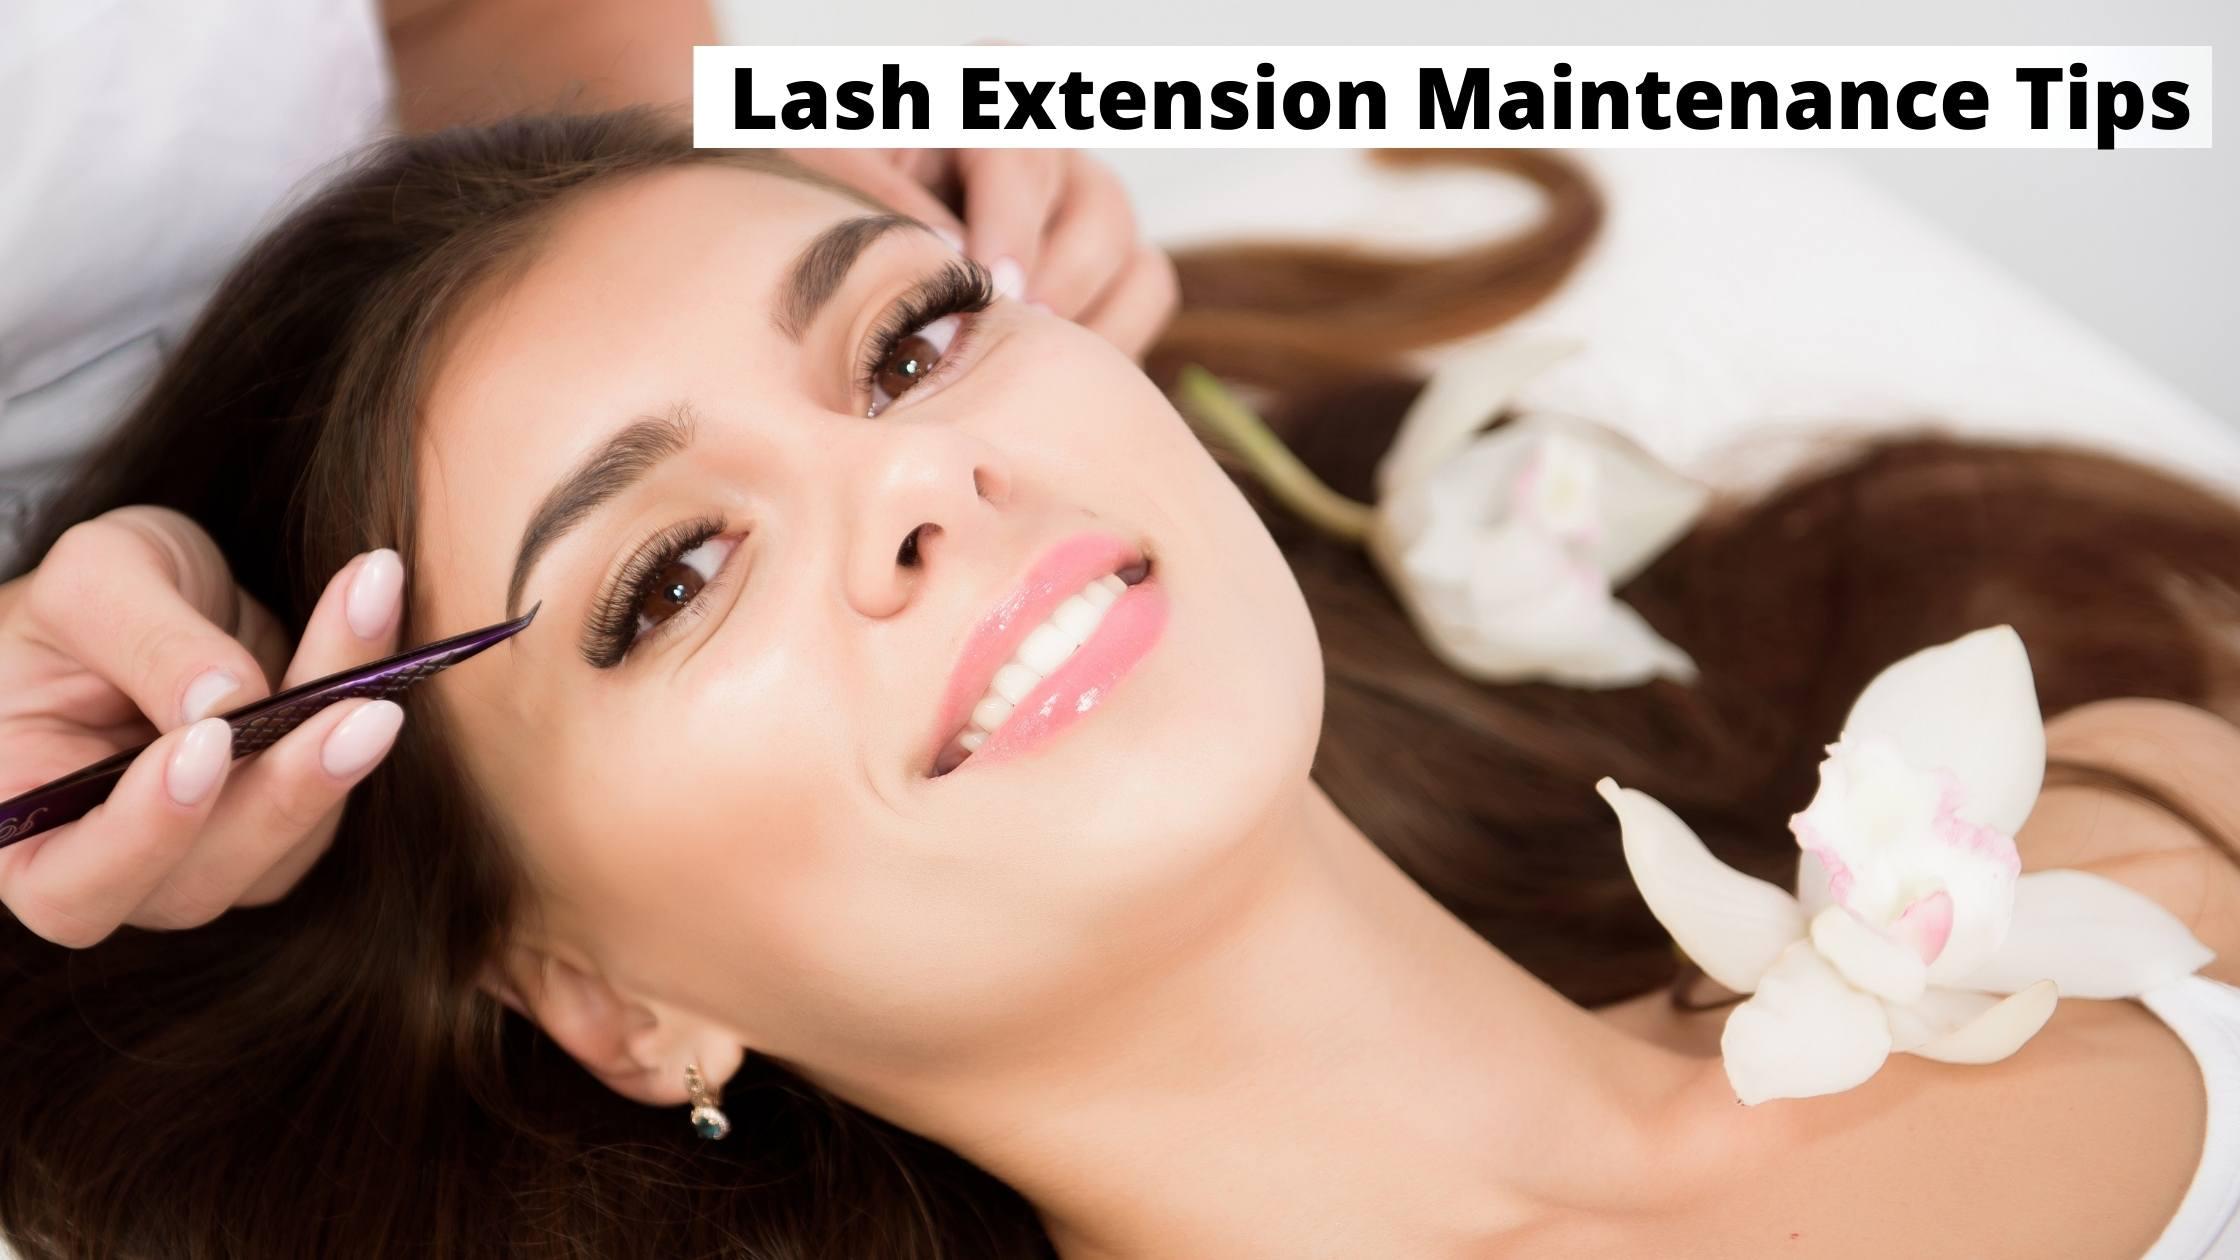 Lash Extension Maintenance Tips